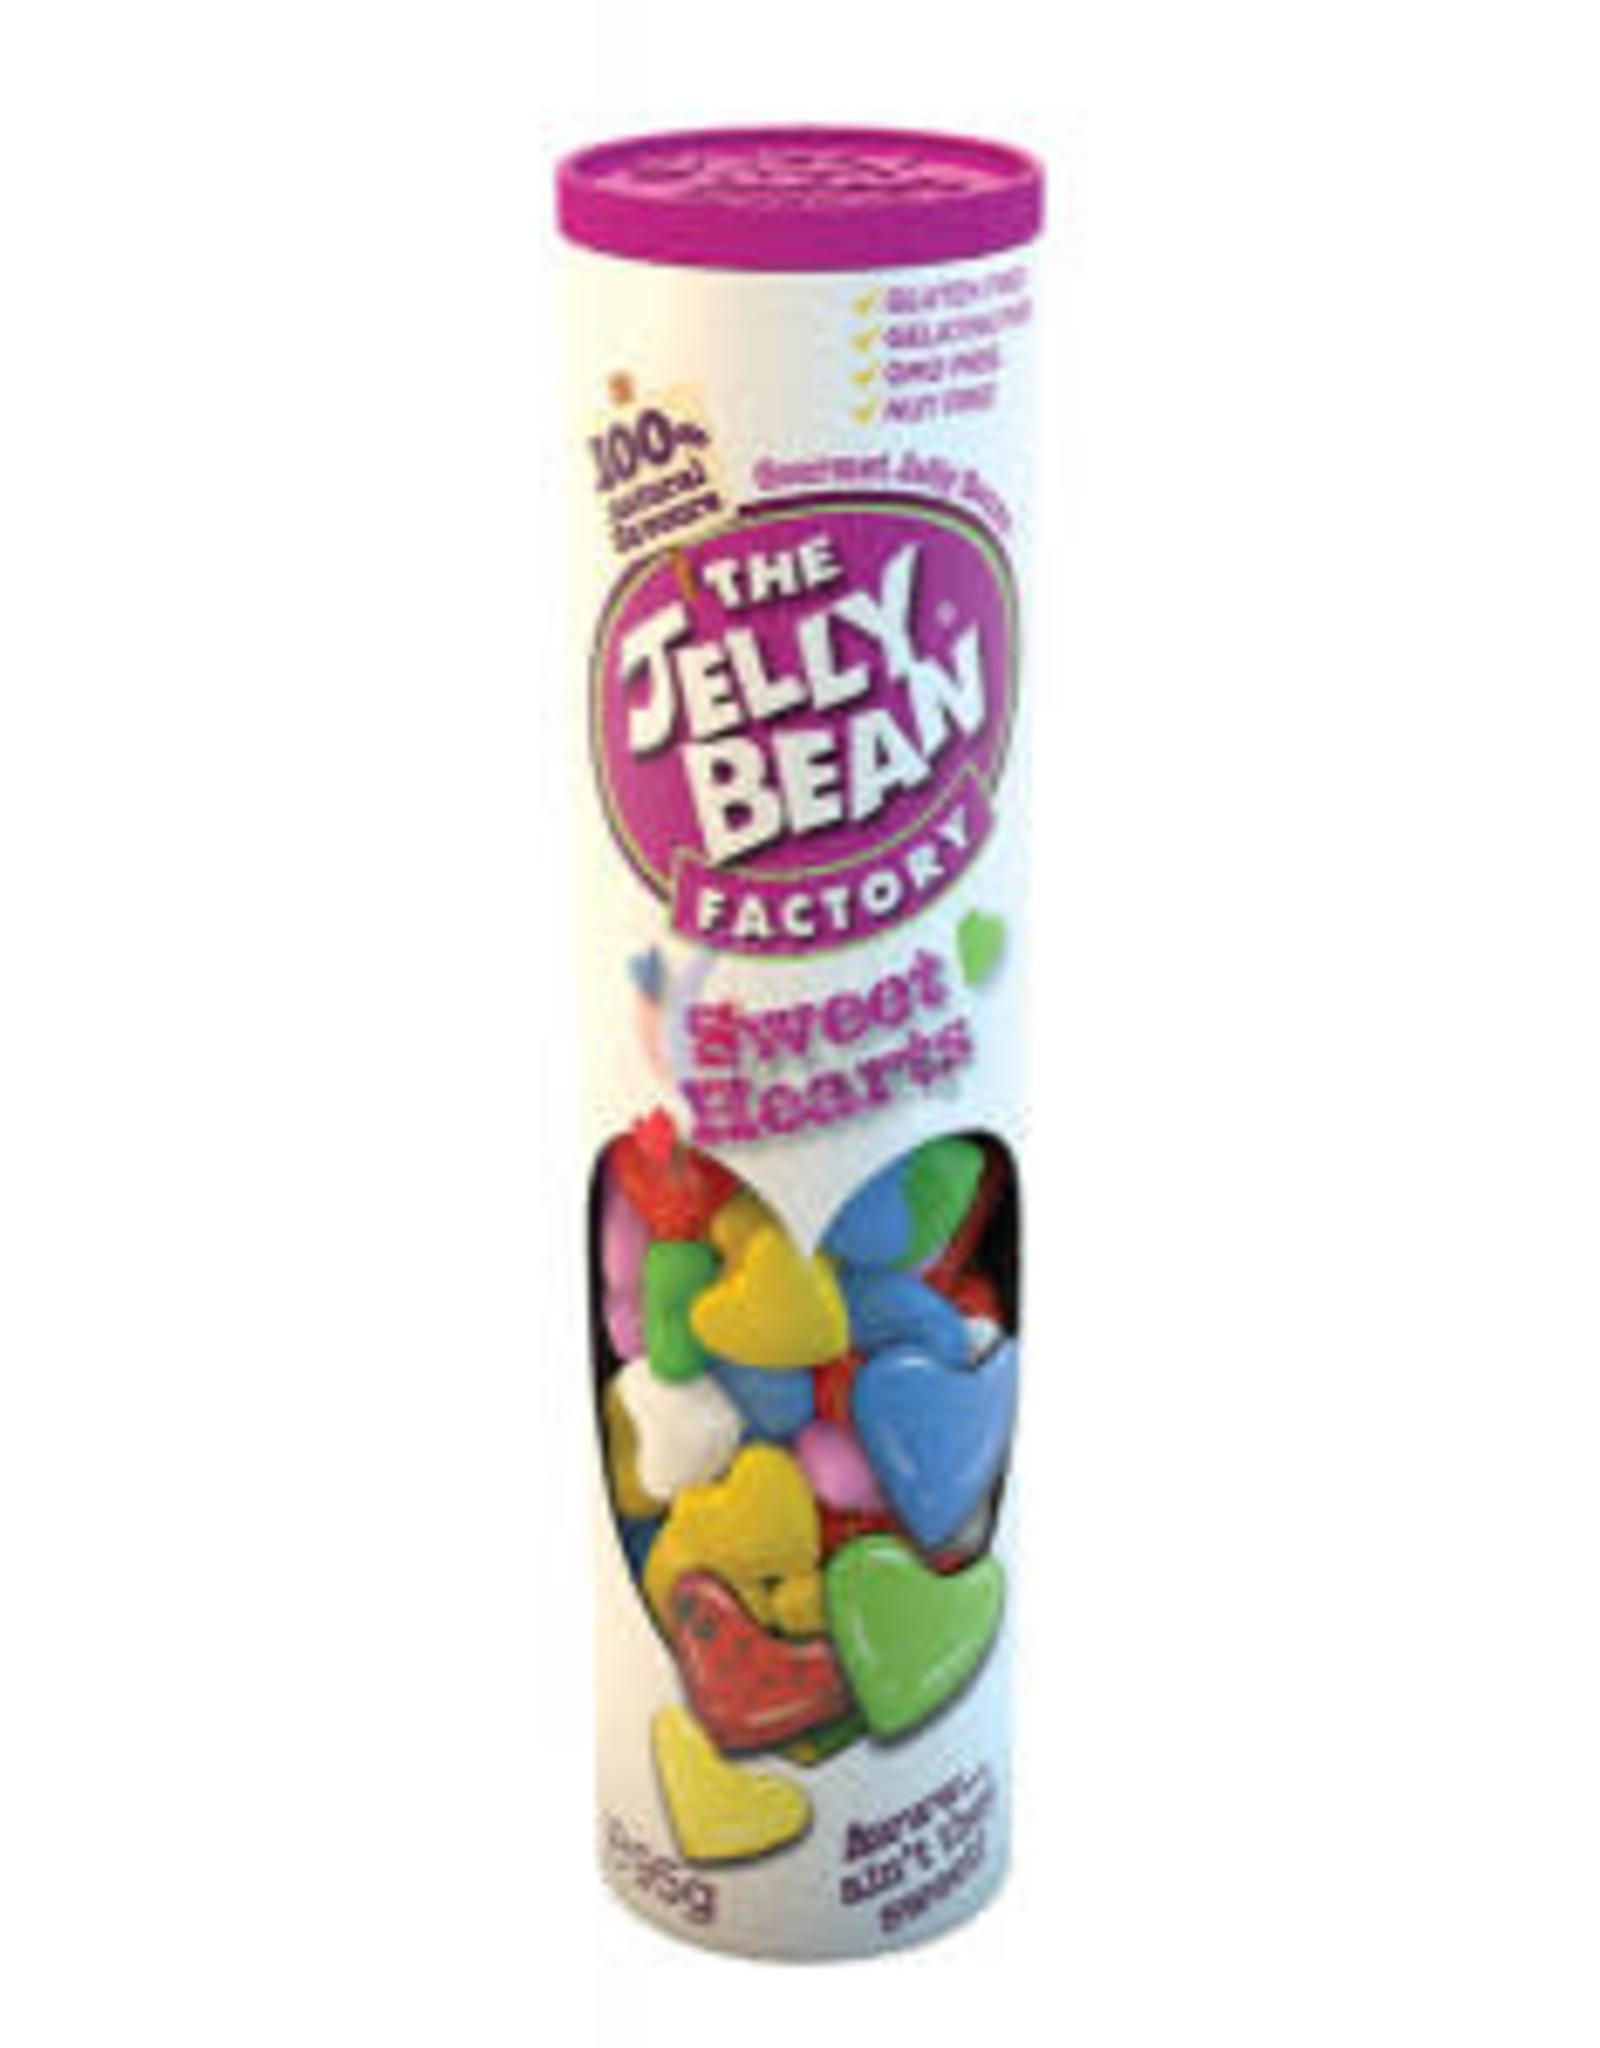 Jelly Bean Factory Sweet Hearts Tube 95 g